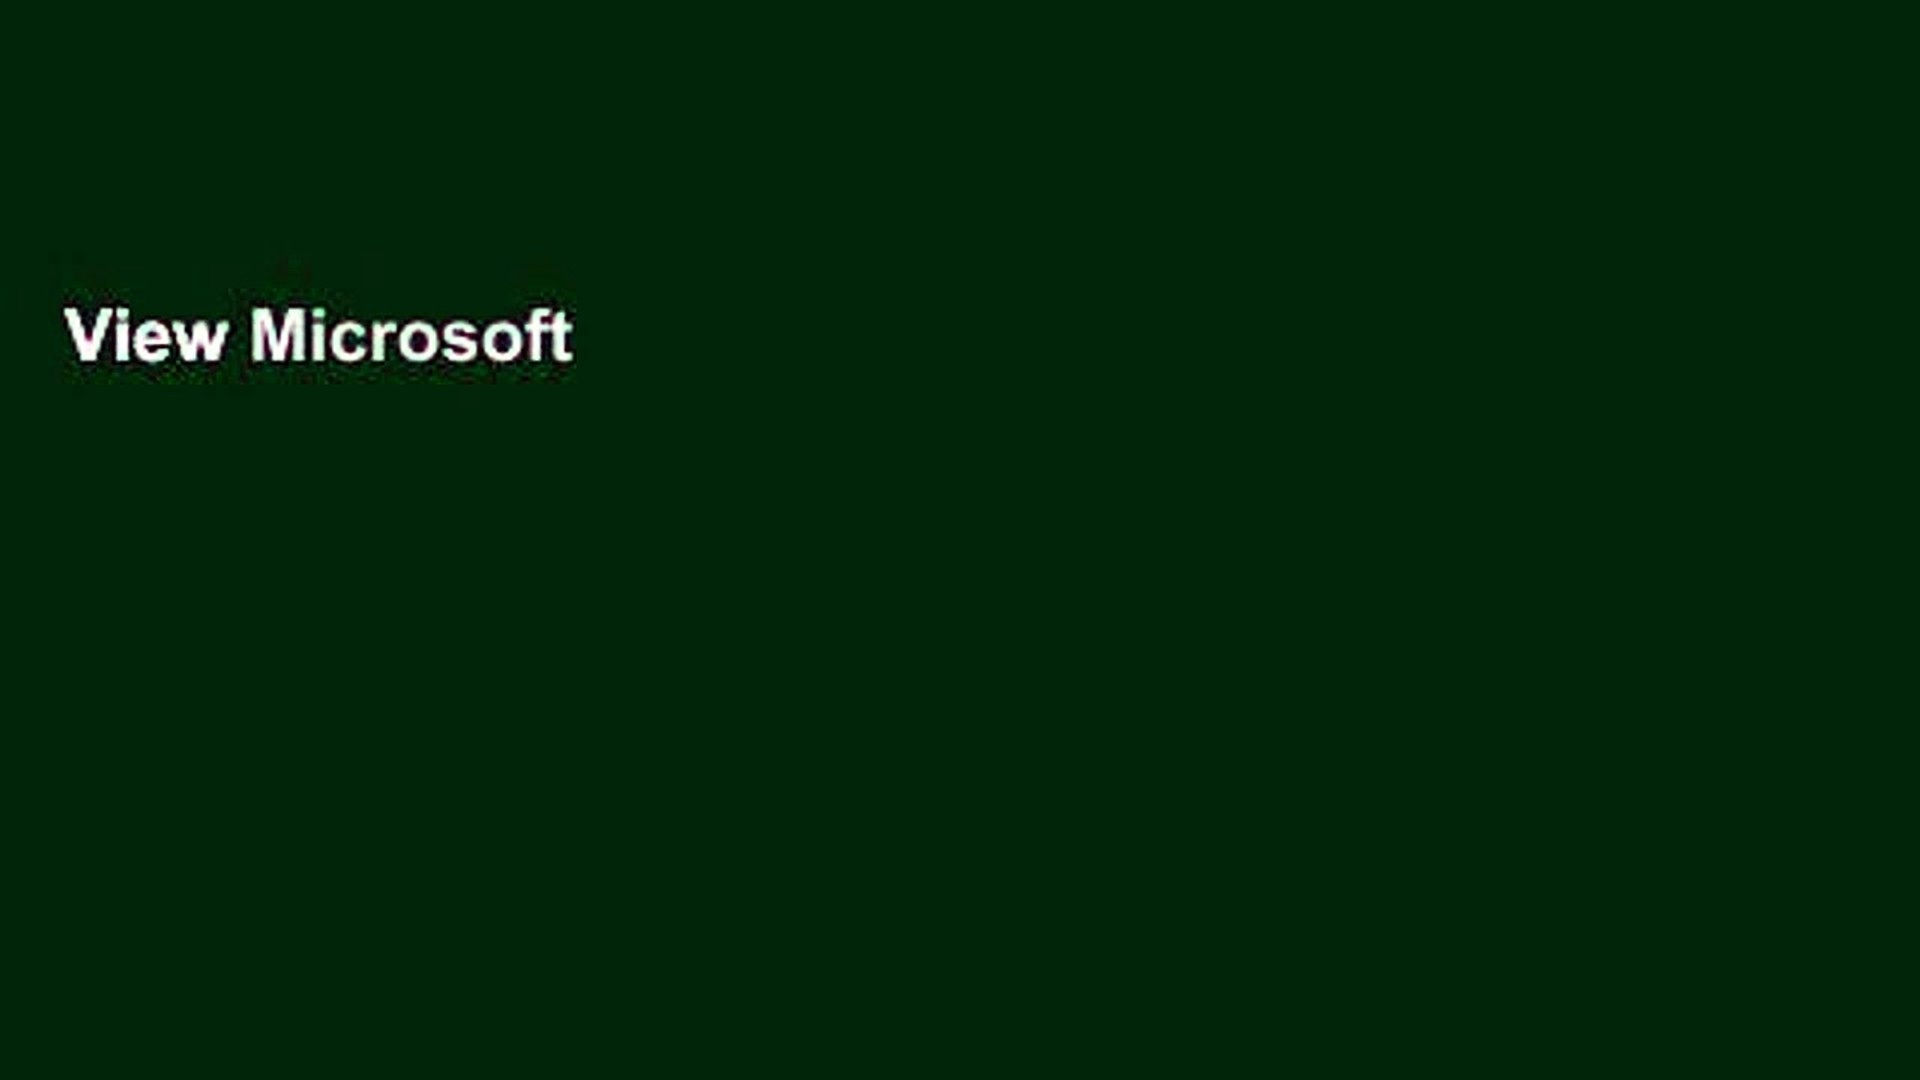 View Microsoft SharePoint 2007 Wrox Box: Professional SharePoint 2007 Development, Real World